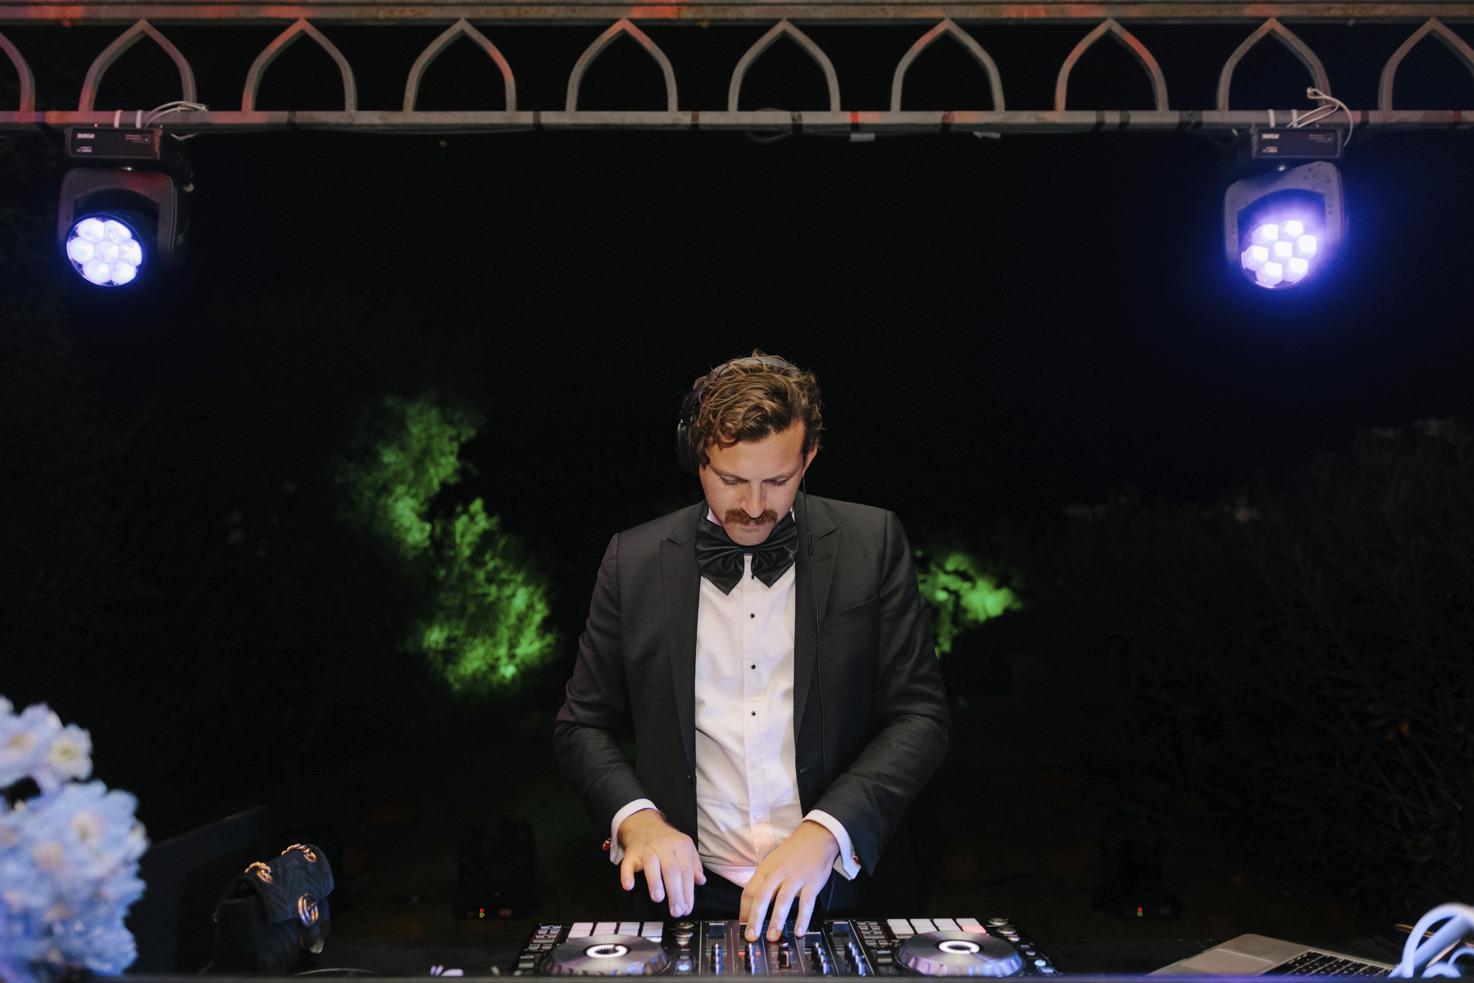 DJ for wedding reception in Italy